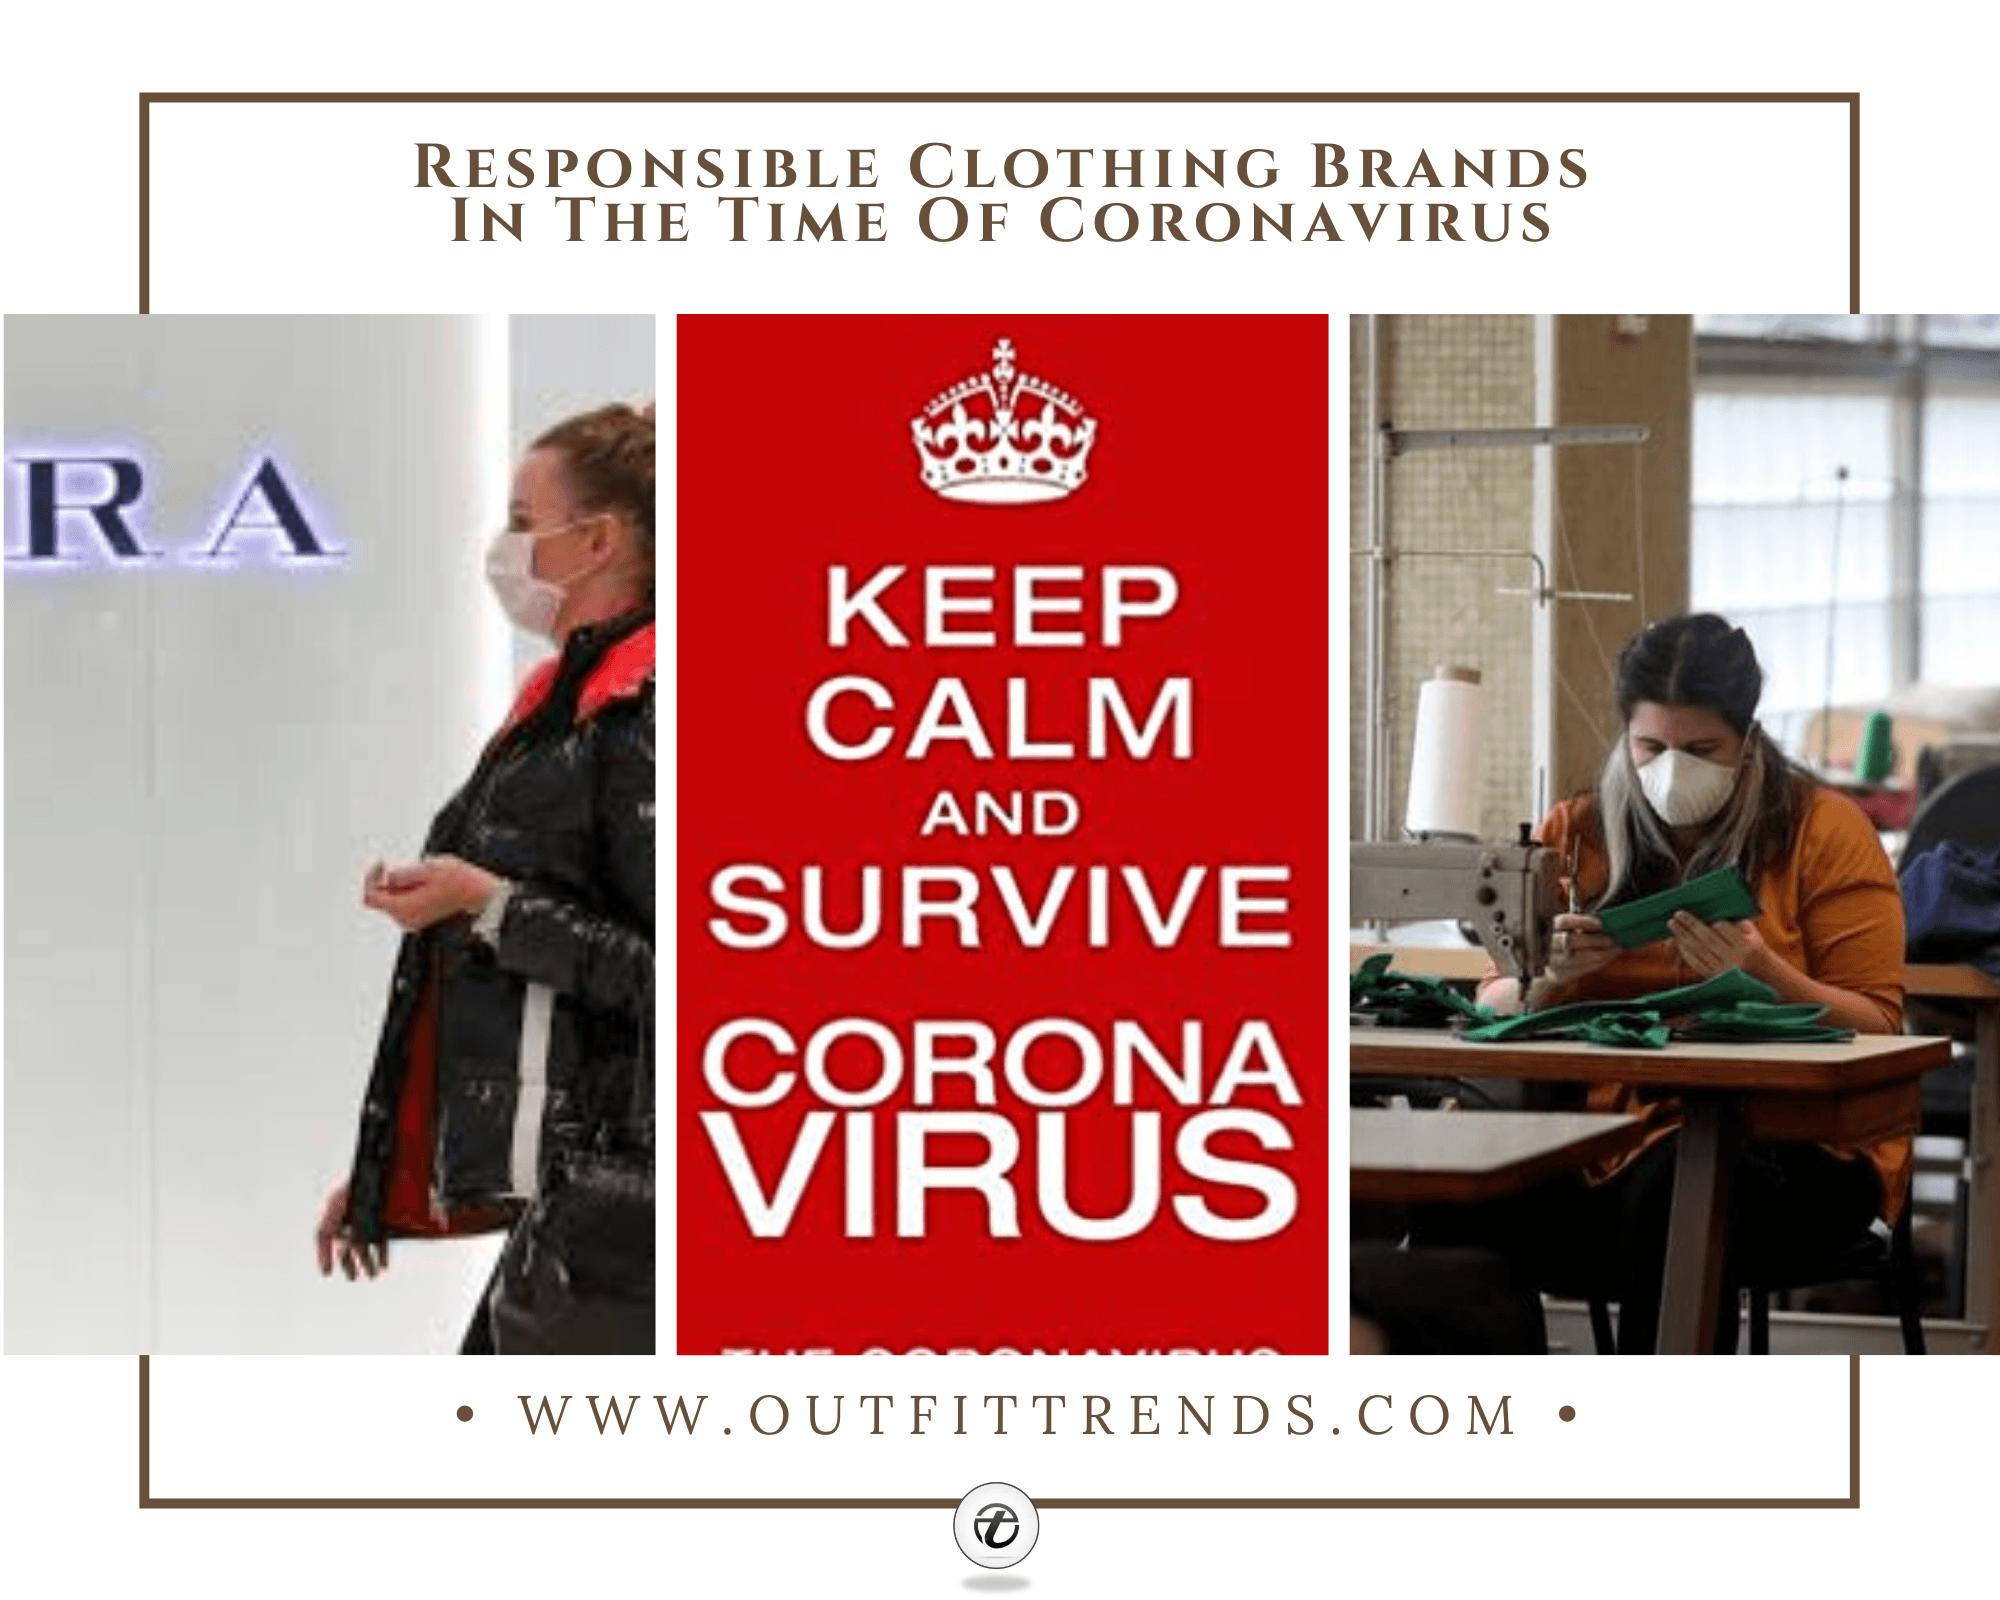 How 25 Top Fashion Brands Are Helping To Combat Coronavirus